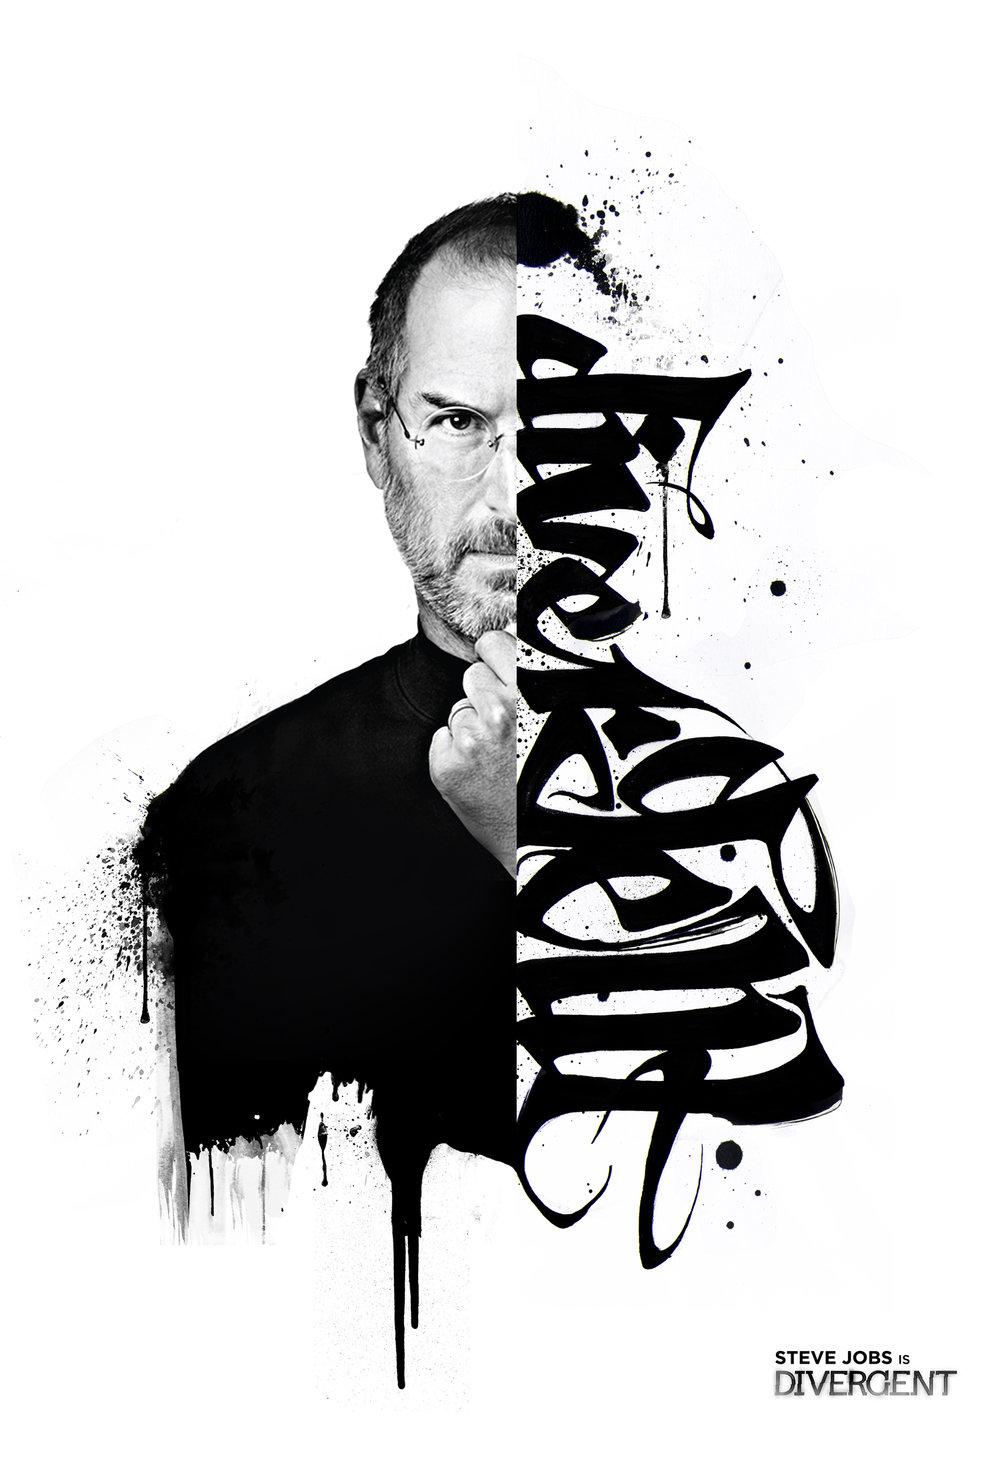 DIVERGENT_calligrafitti_JOBS01.jpg